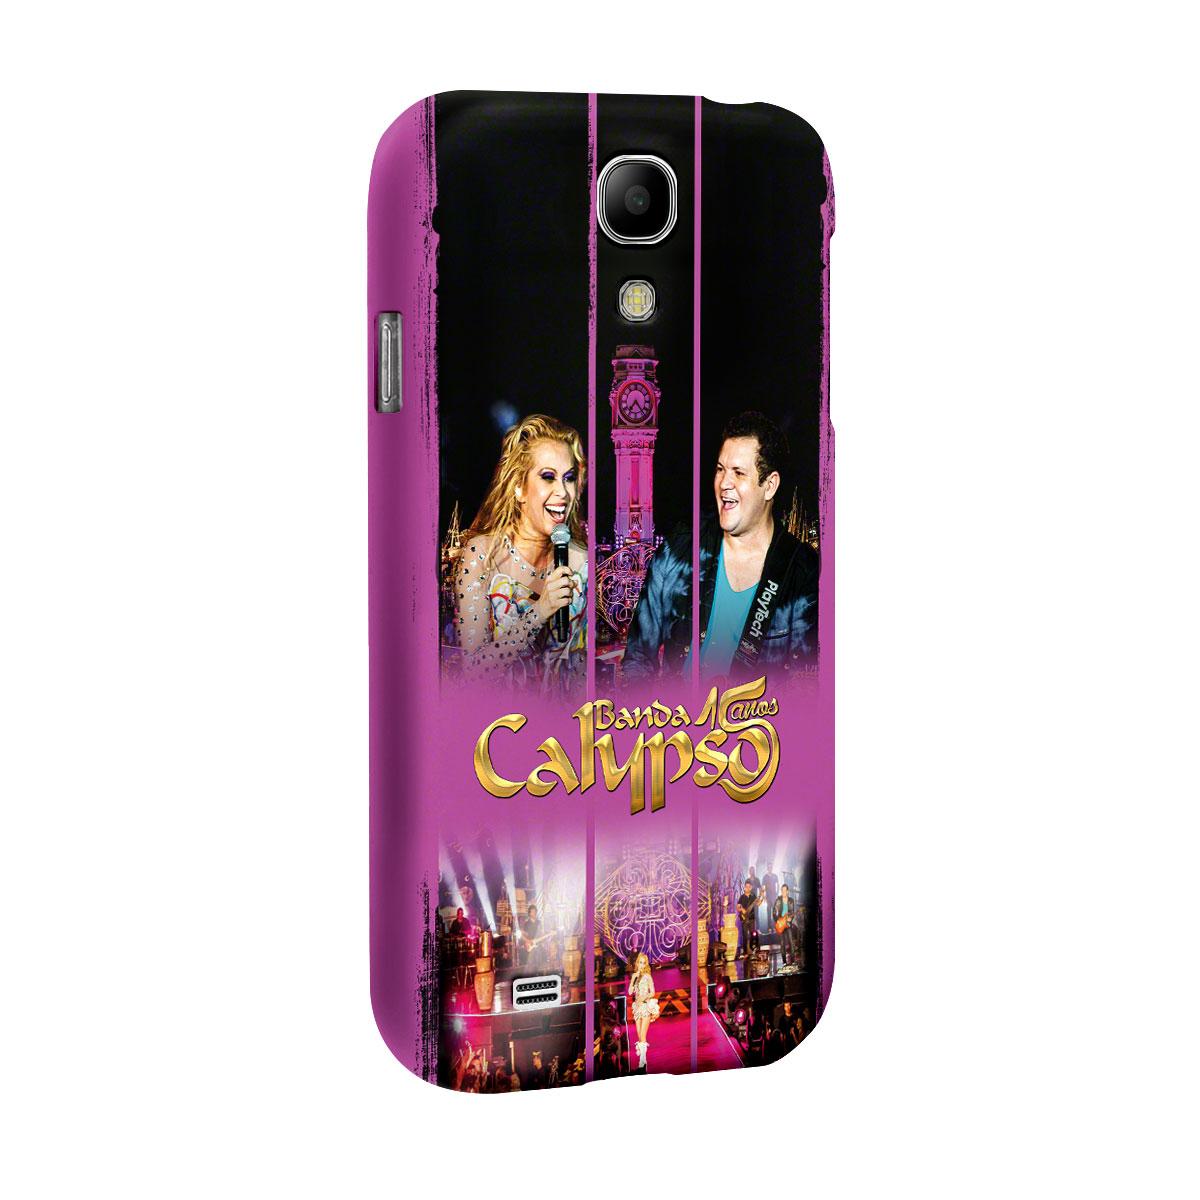 Capa de Celular Samsung Galaxy S4 Calypso 15 Anos